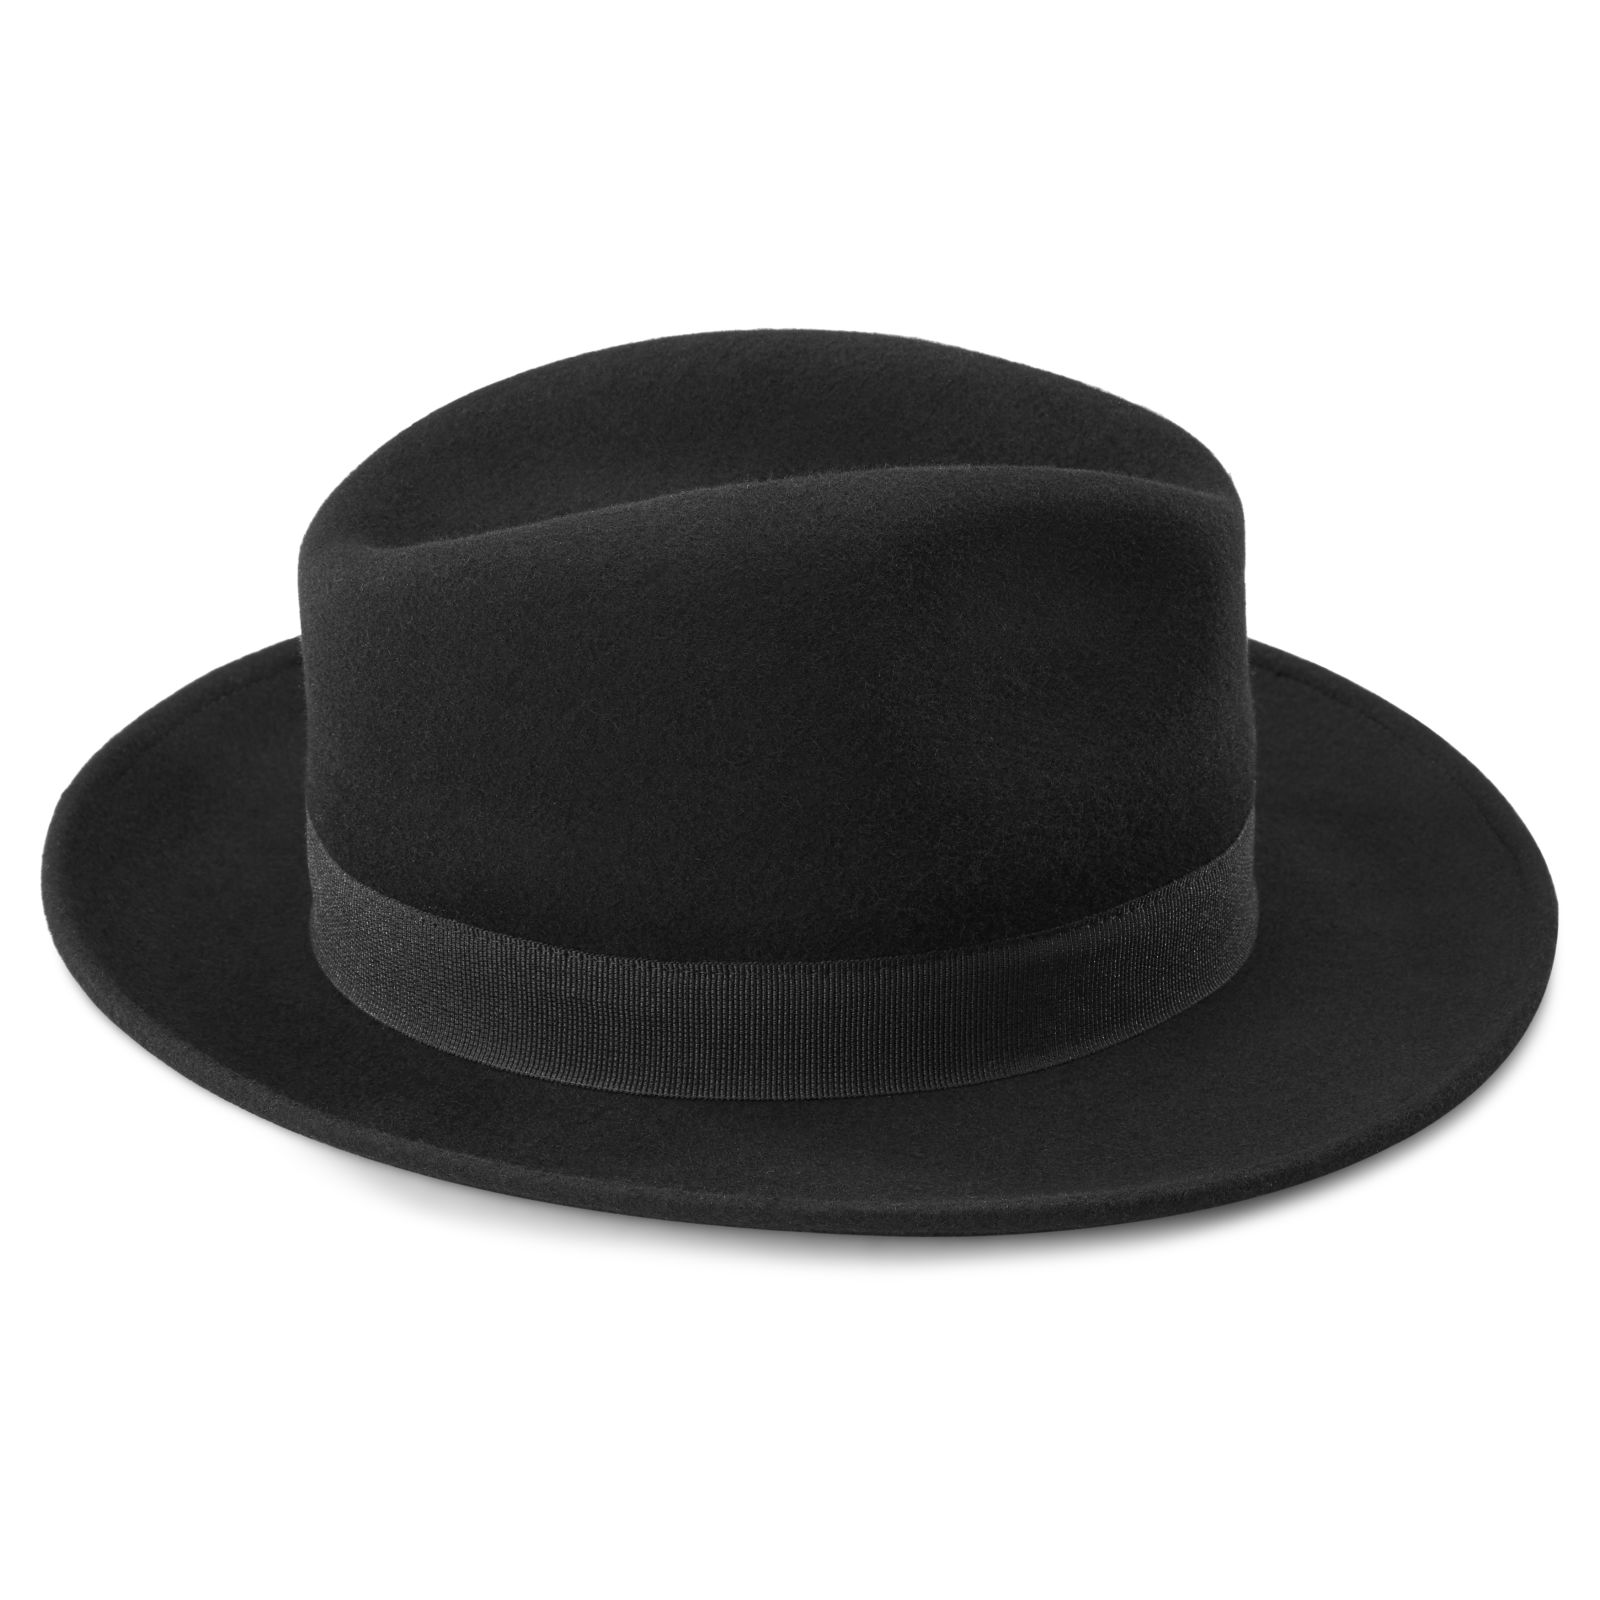 Černý vlněný klobouk Fedora Alessandria Fido  ec91c5431e